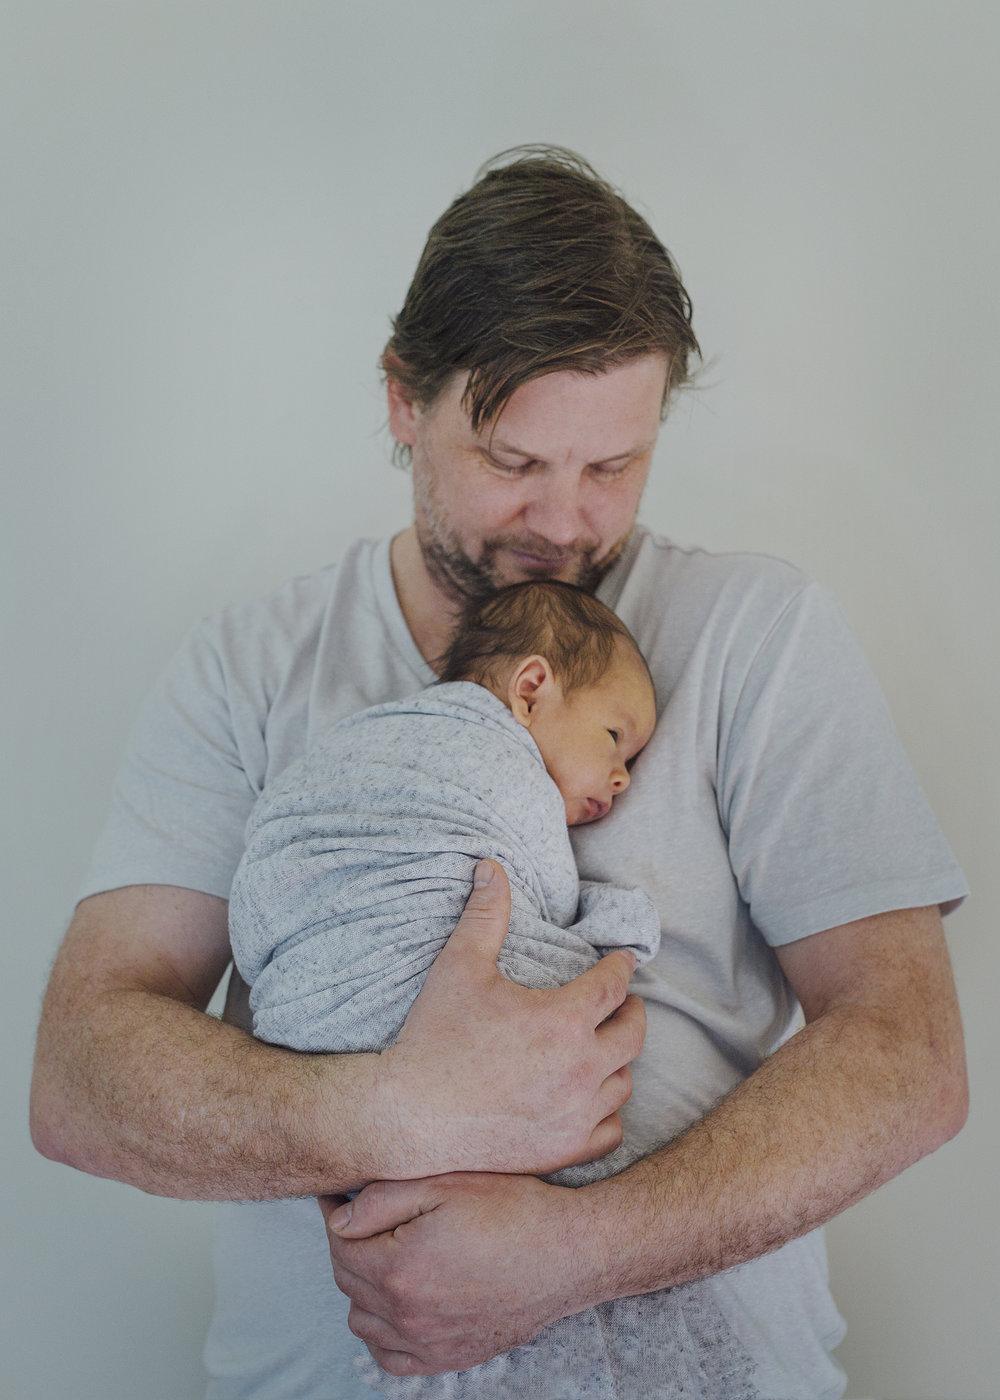 New Dad cuddling his newborn baby son